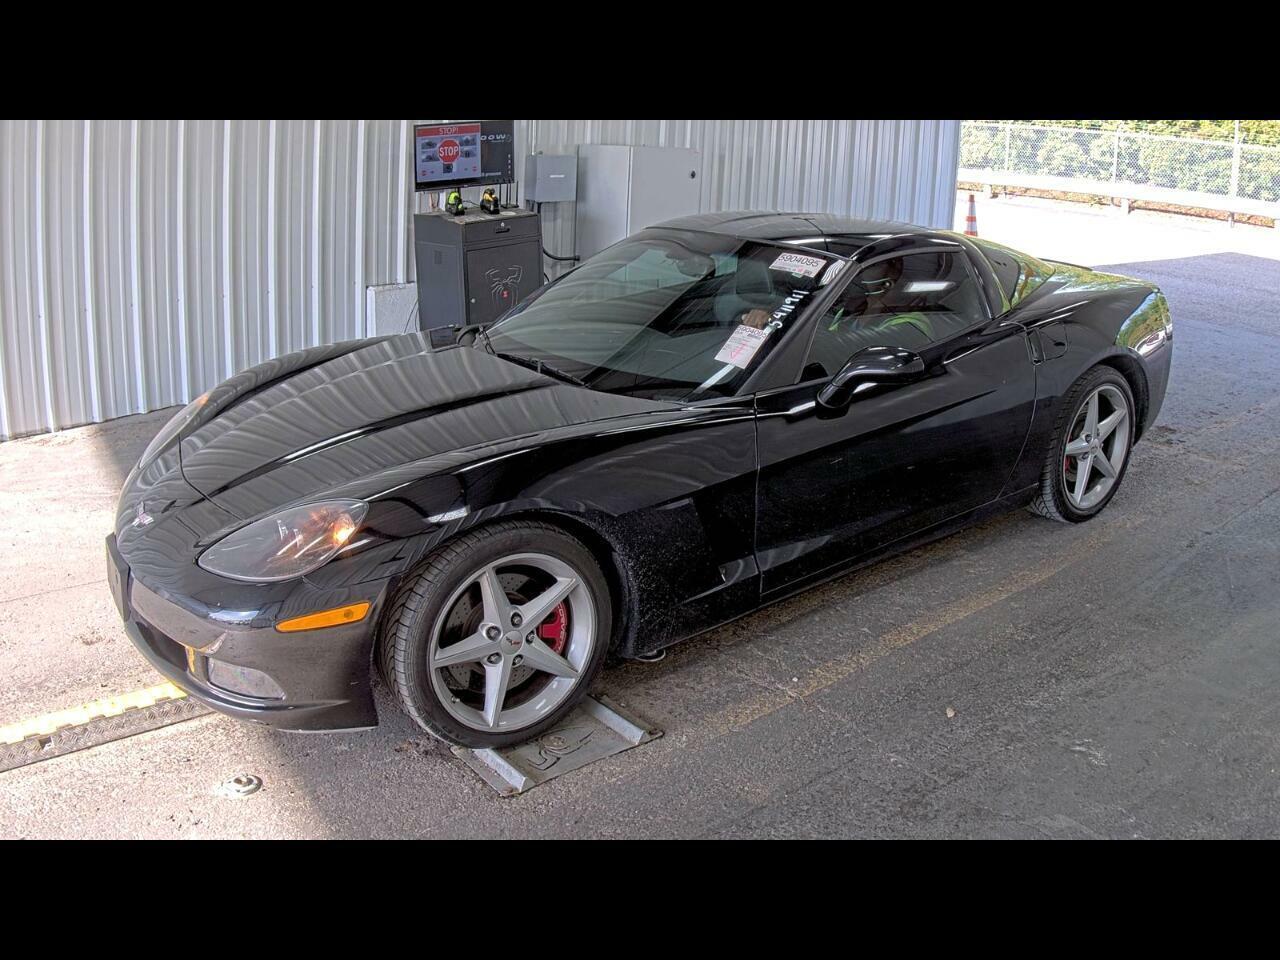 2013 Black Chevrolet Corvette   | C6 Corvette Photo 1